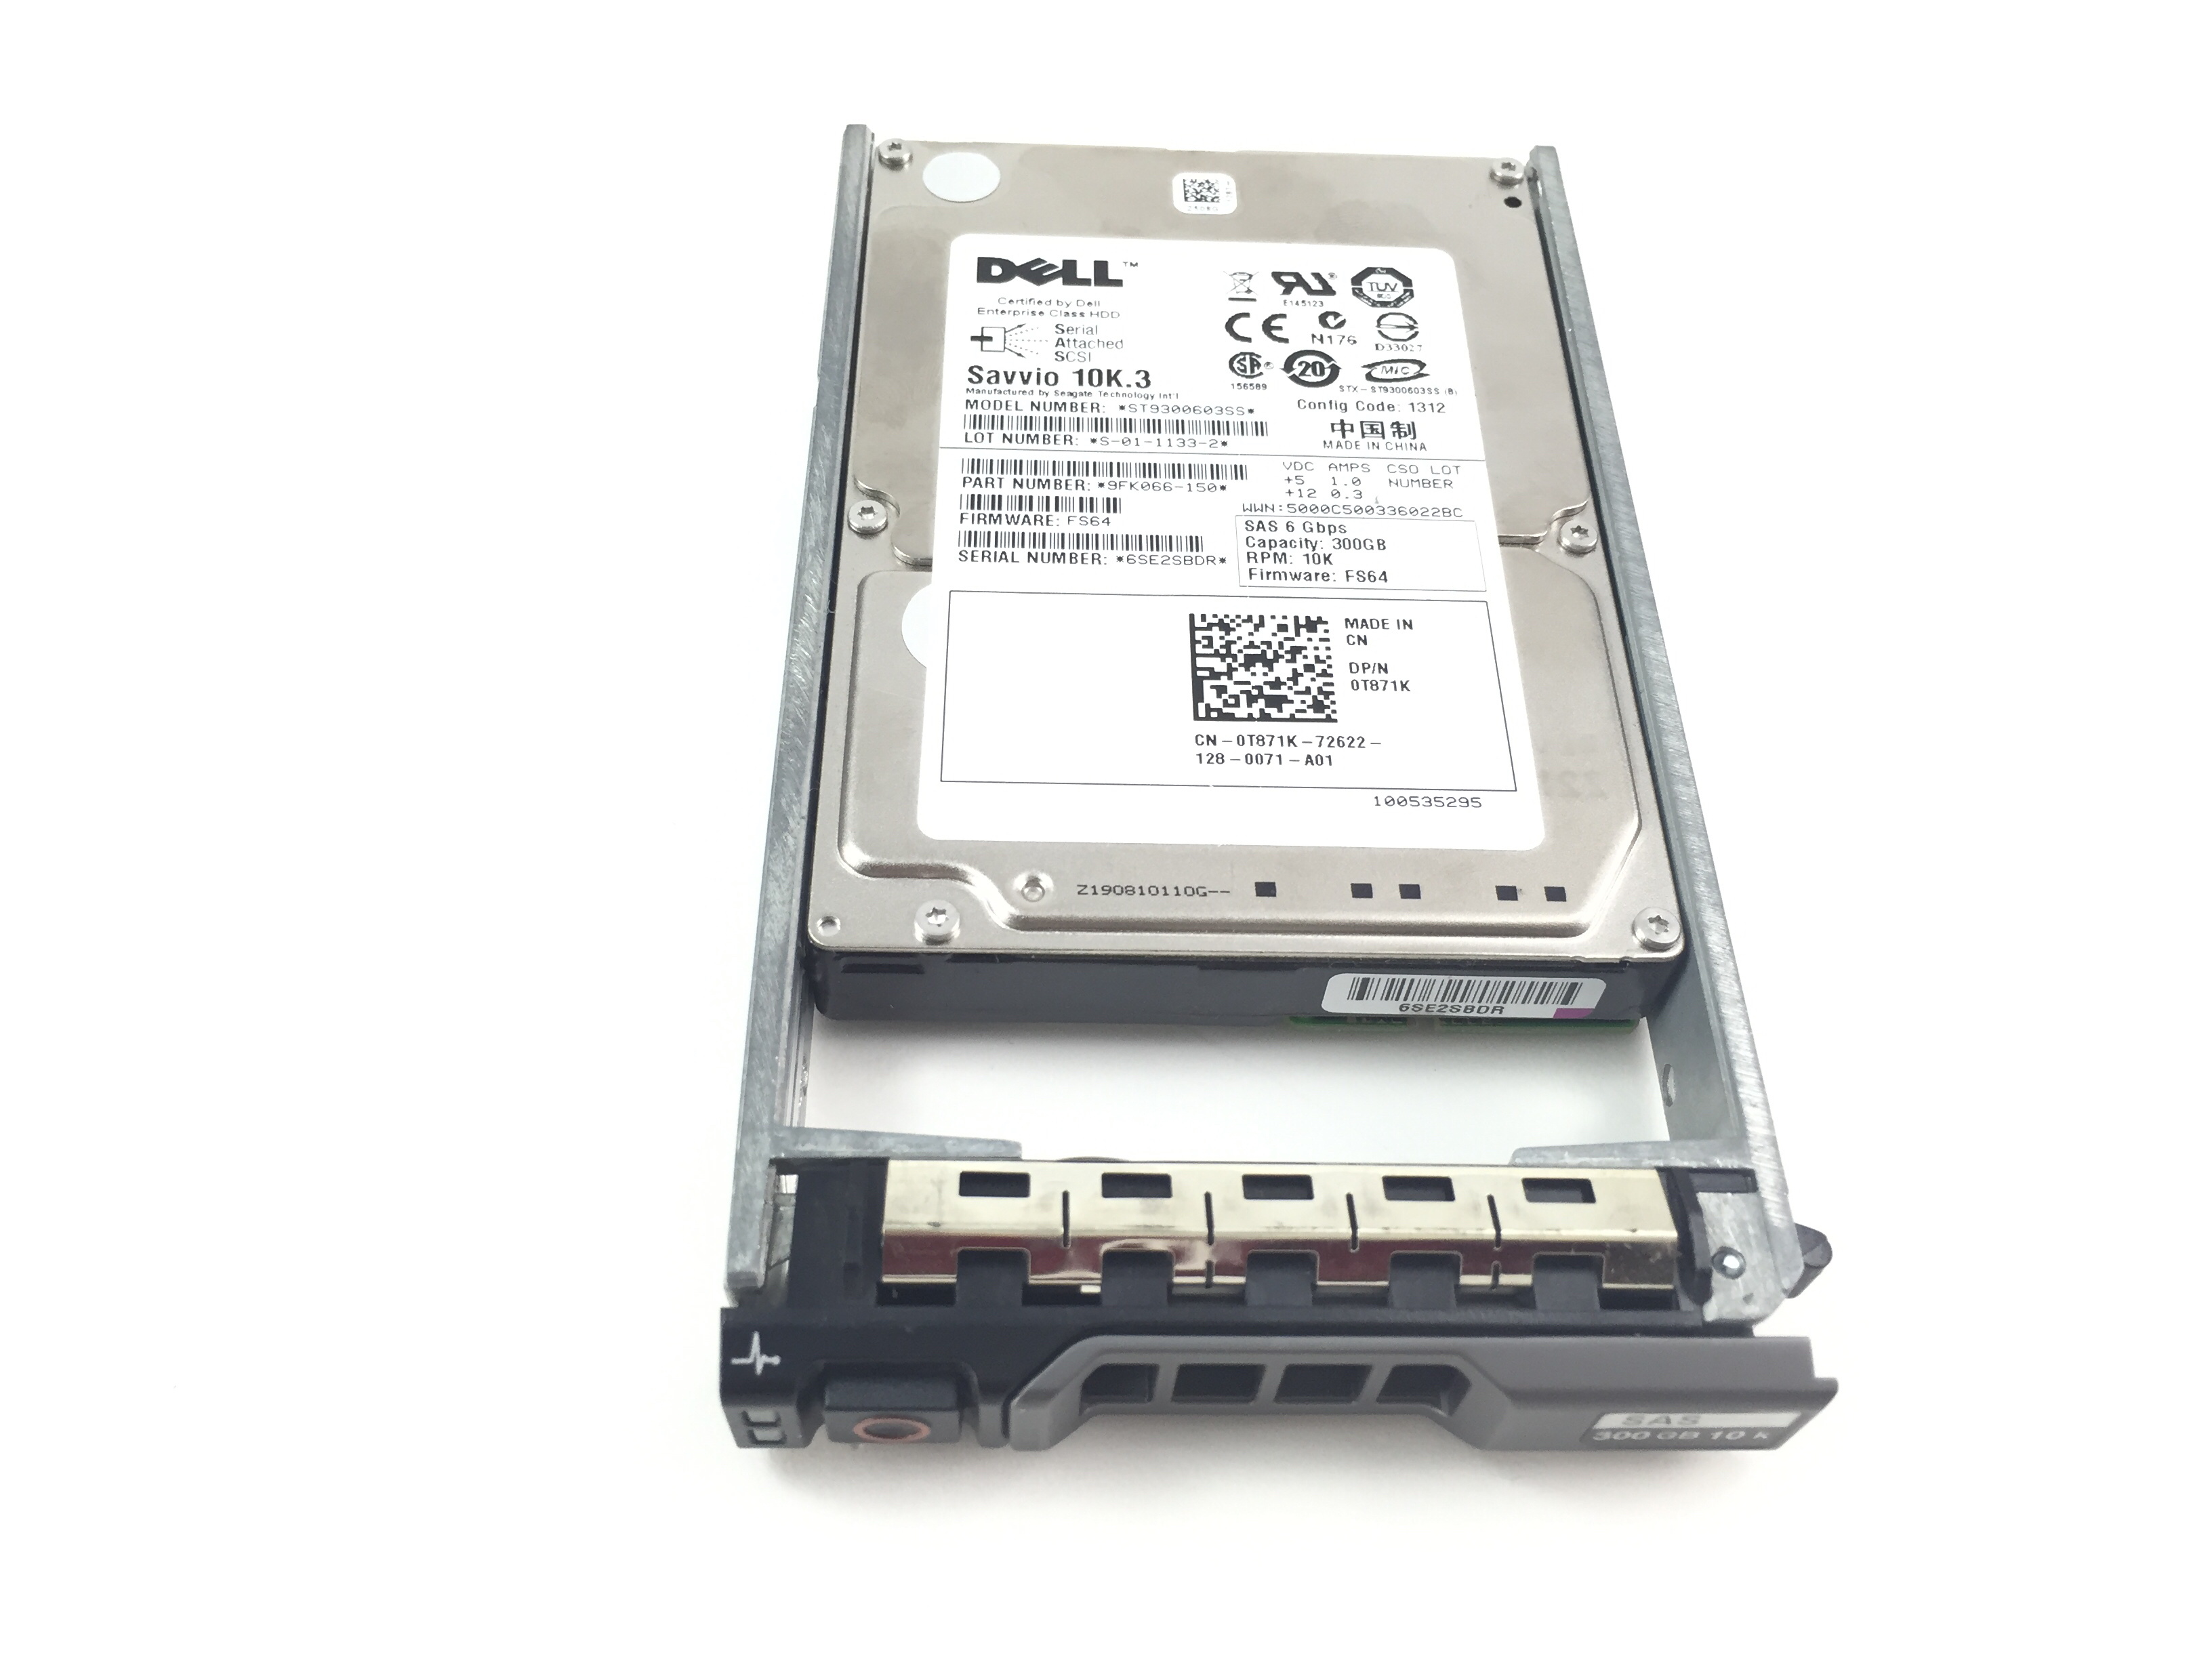 DELL 300GB 10K 6GBPS SAS 2.5'' HARD DRIVE W /R SERIES TRAY (T871K)